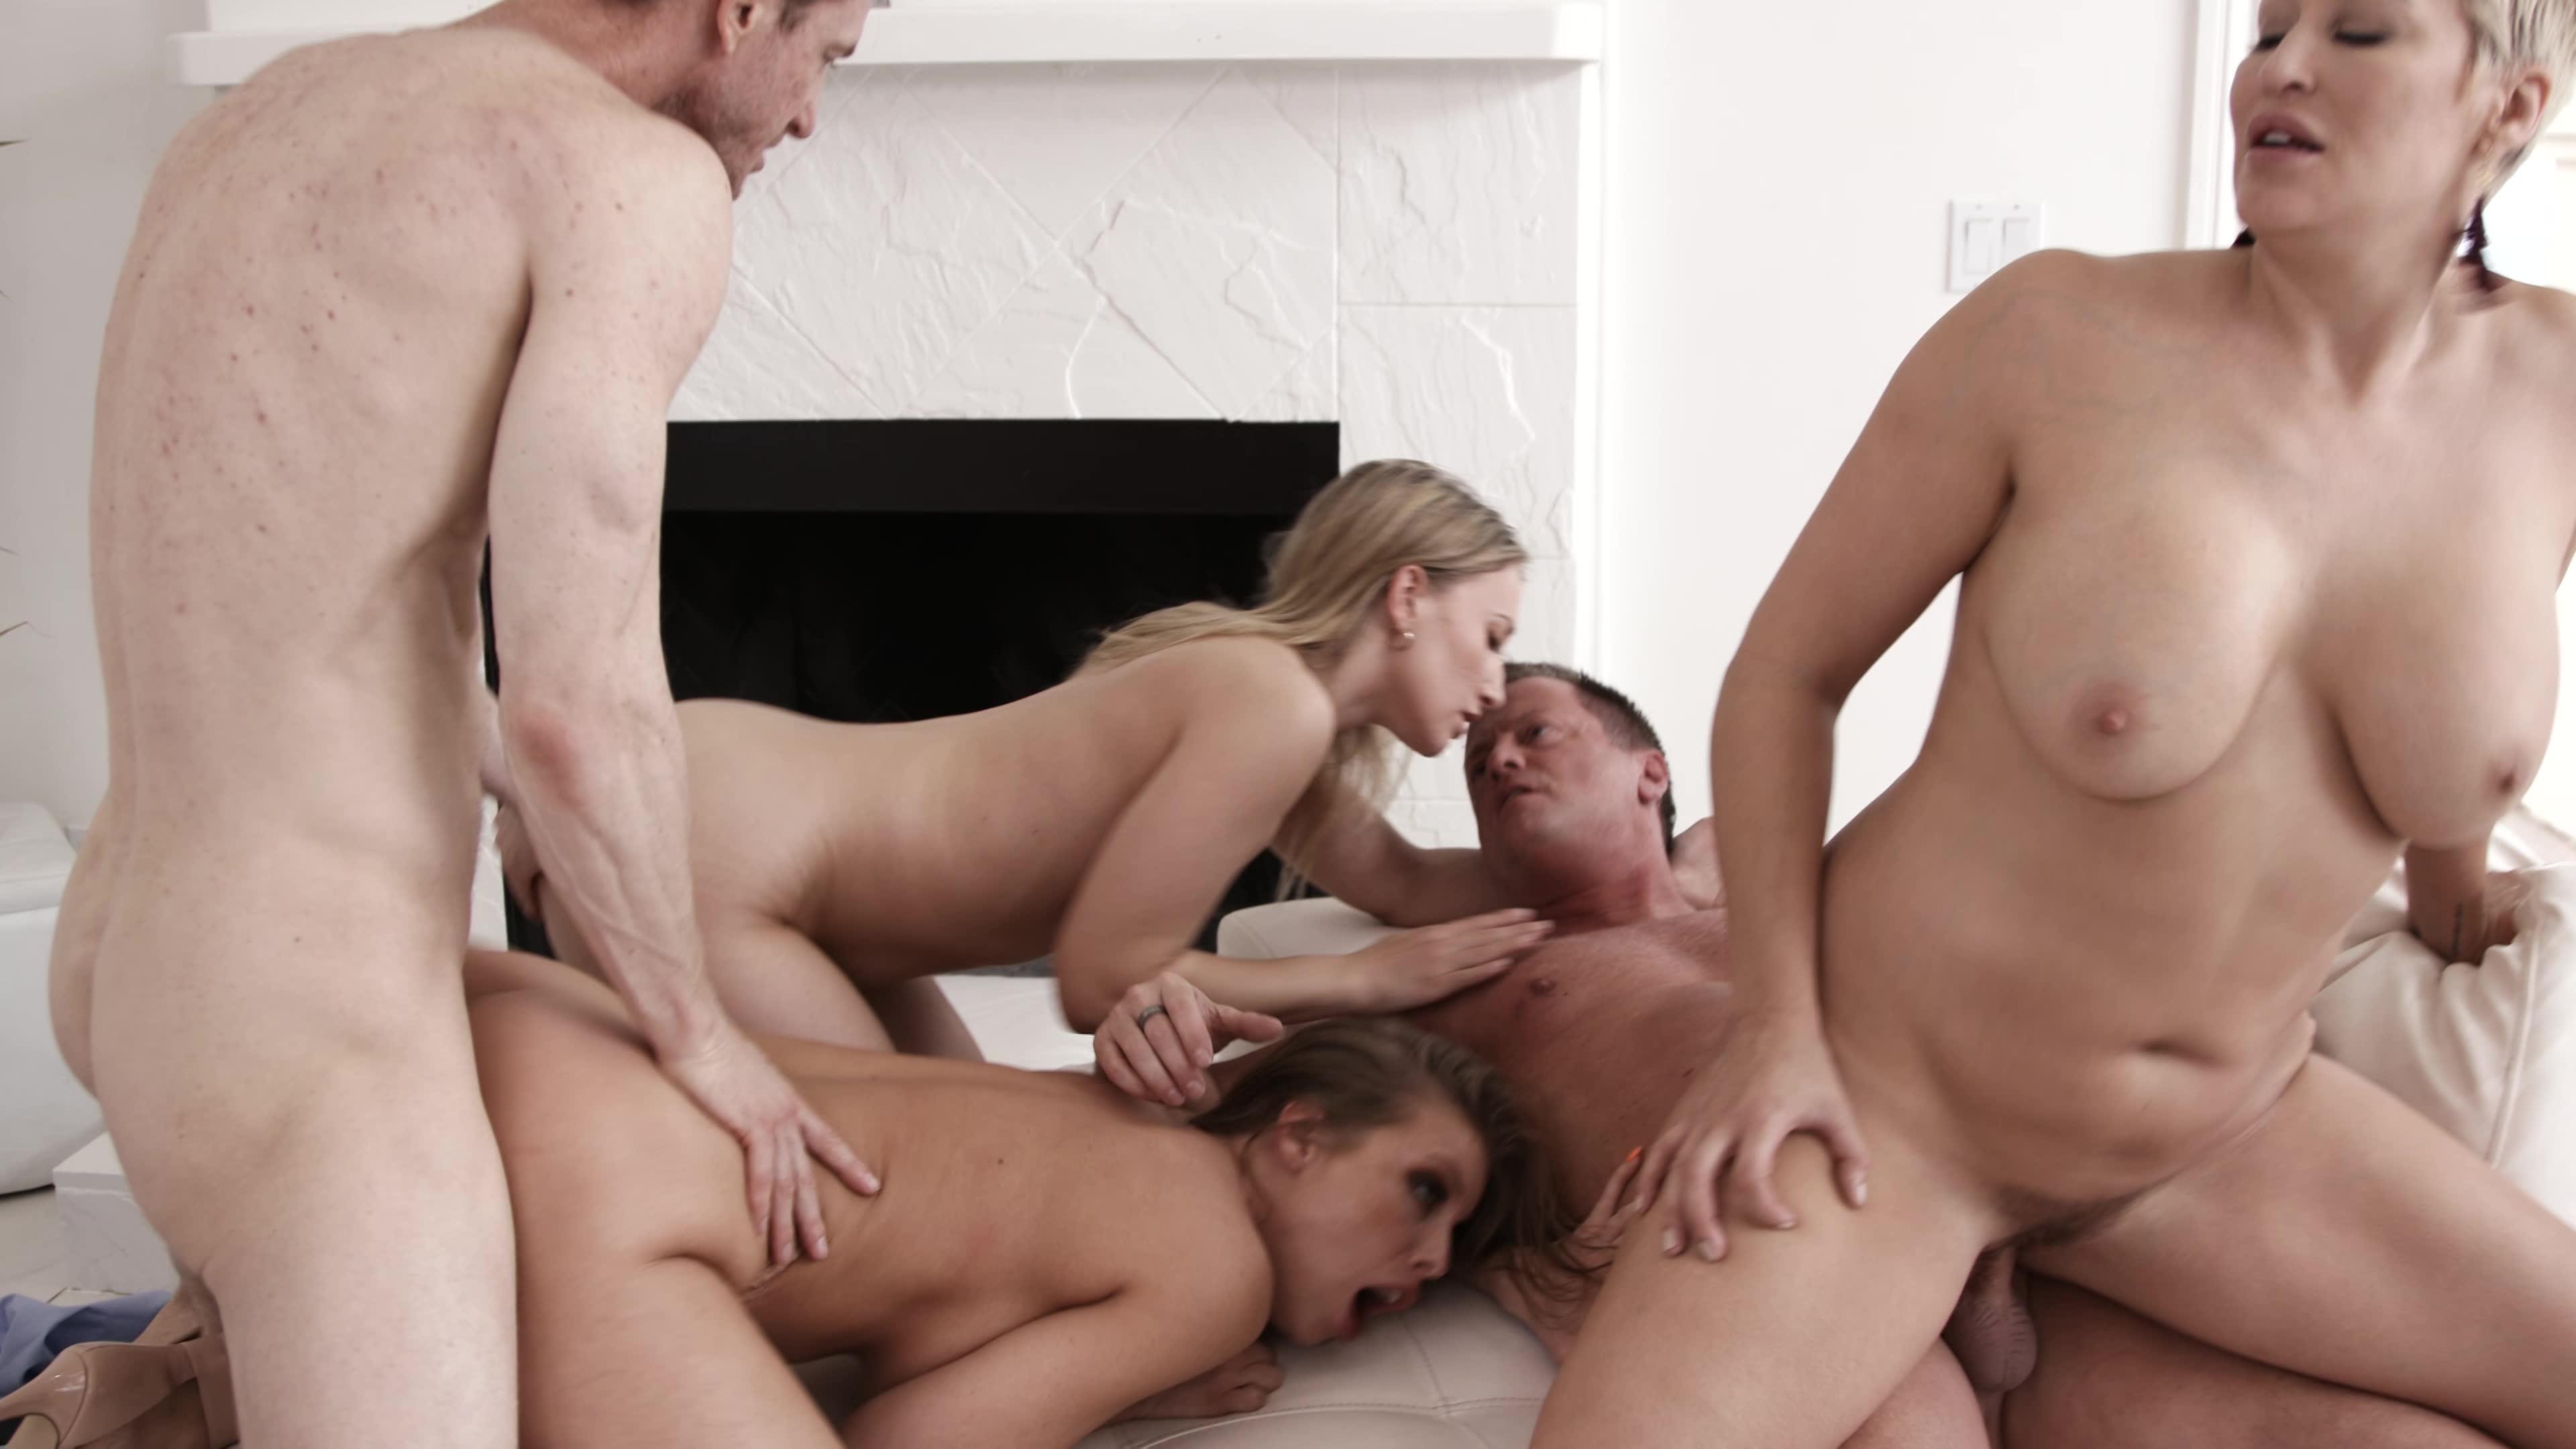 Best free jav wife porn photo sex online streaming hd